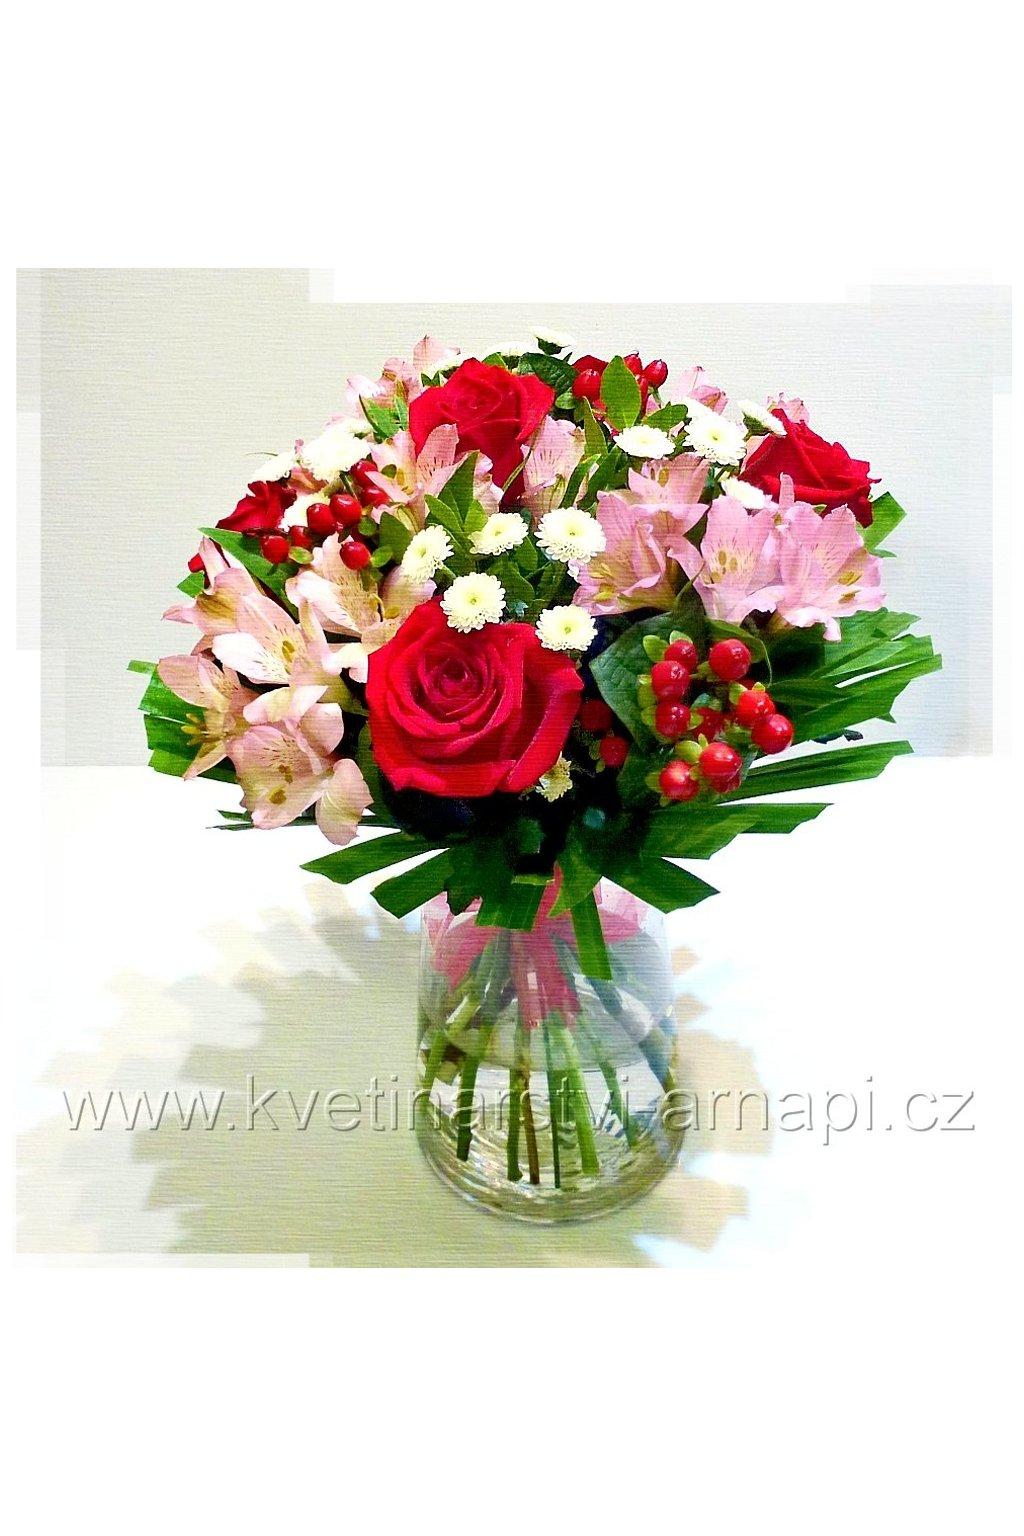 kytice ruze darkova prodej online kvetinarstvi arnapi